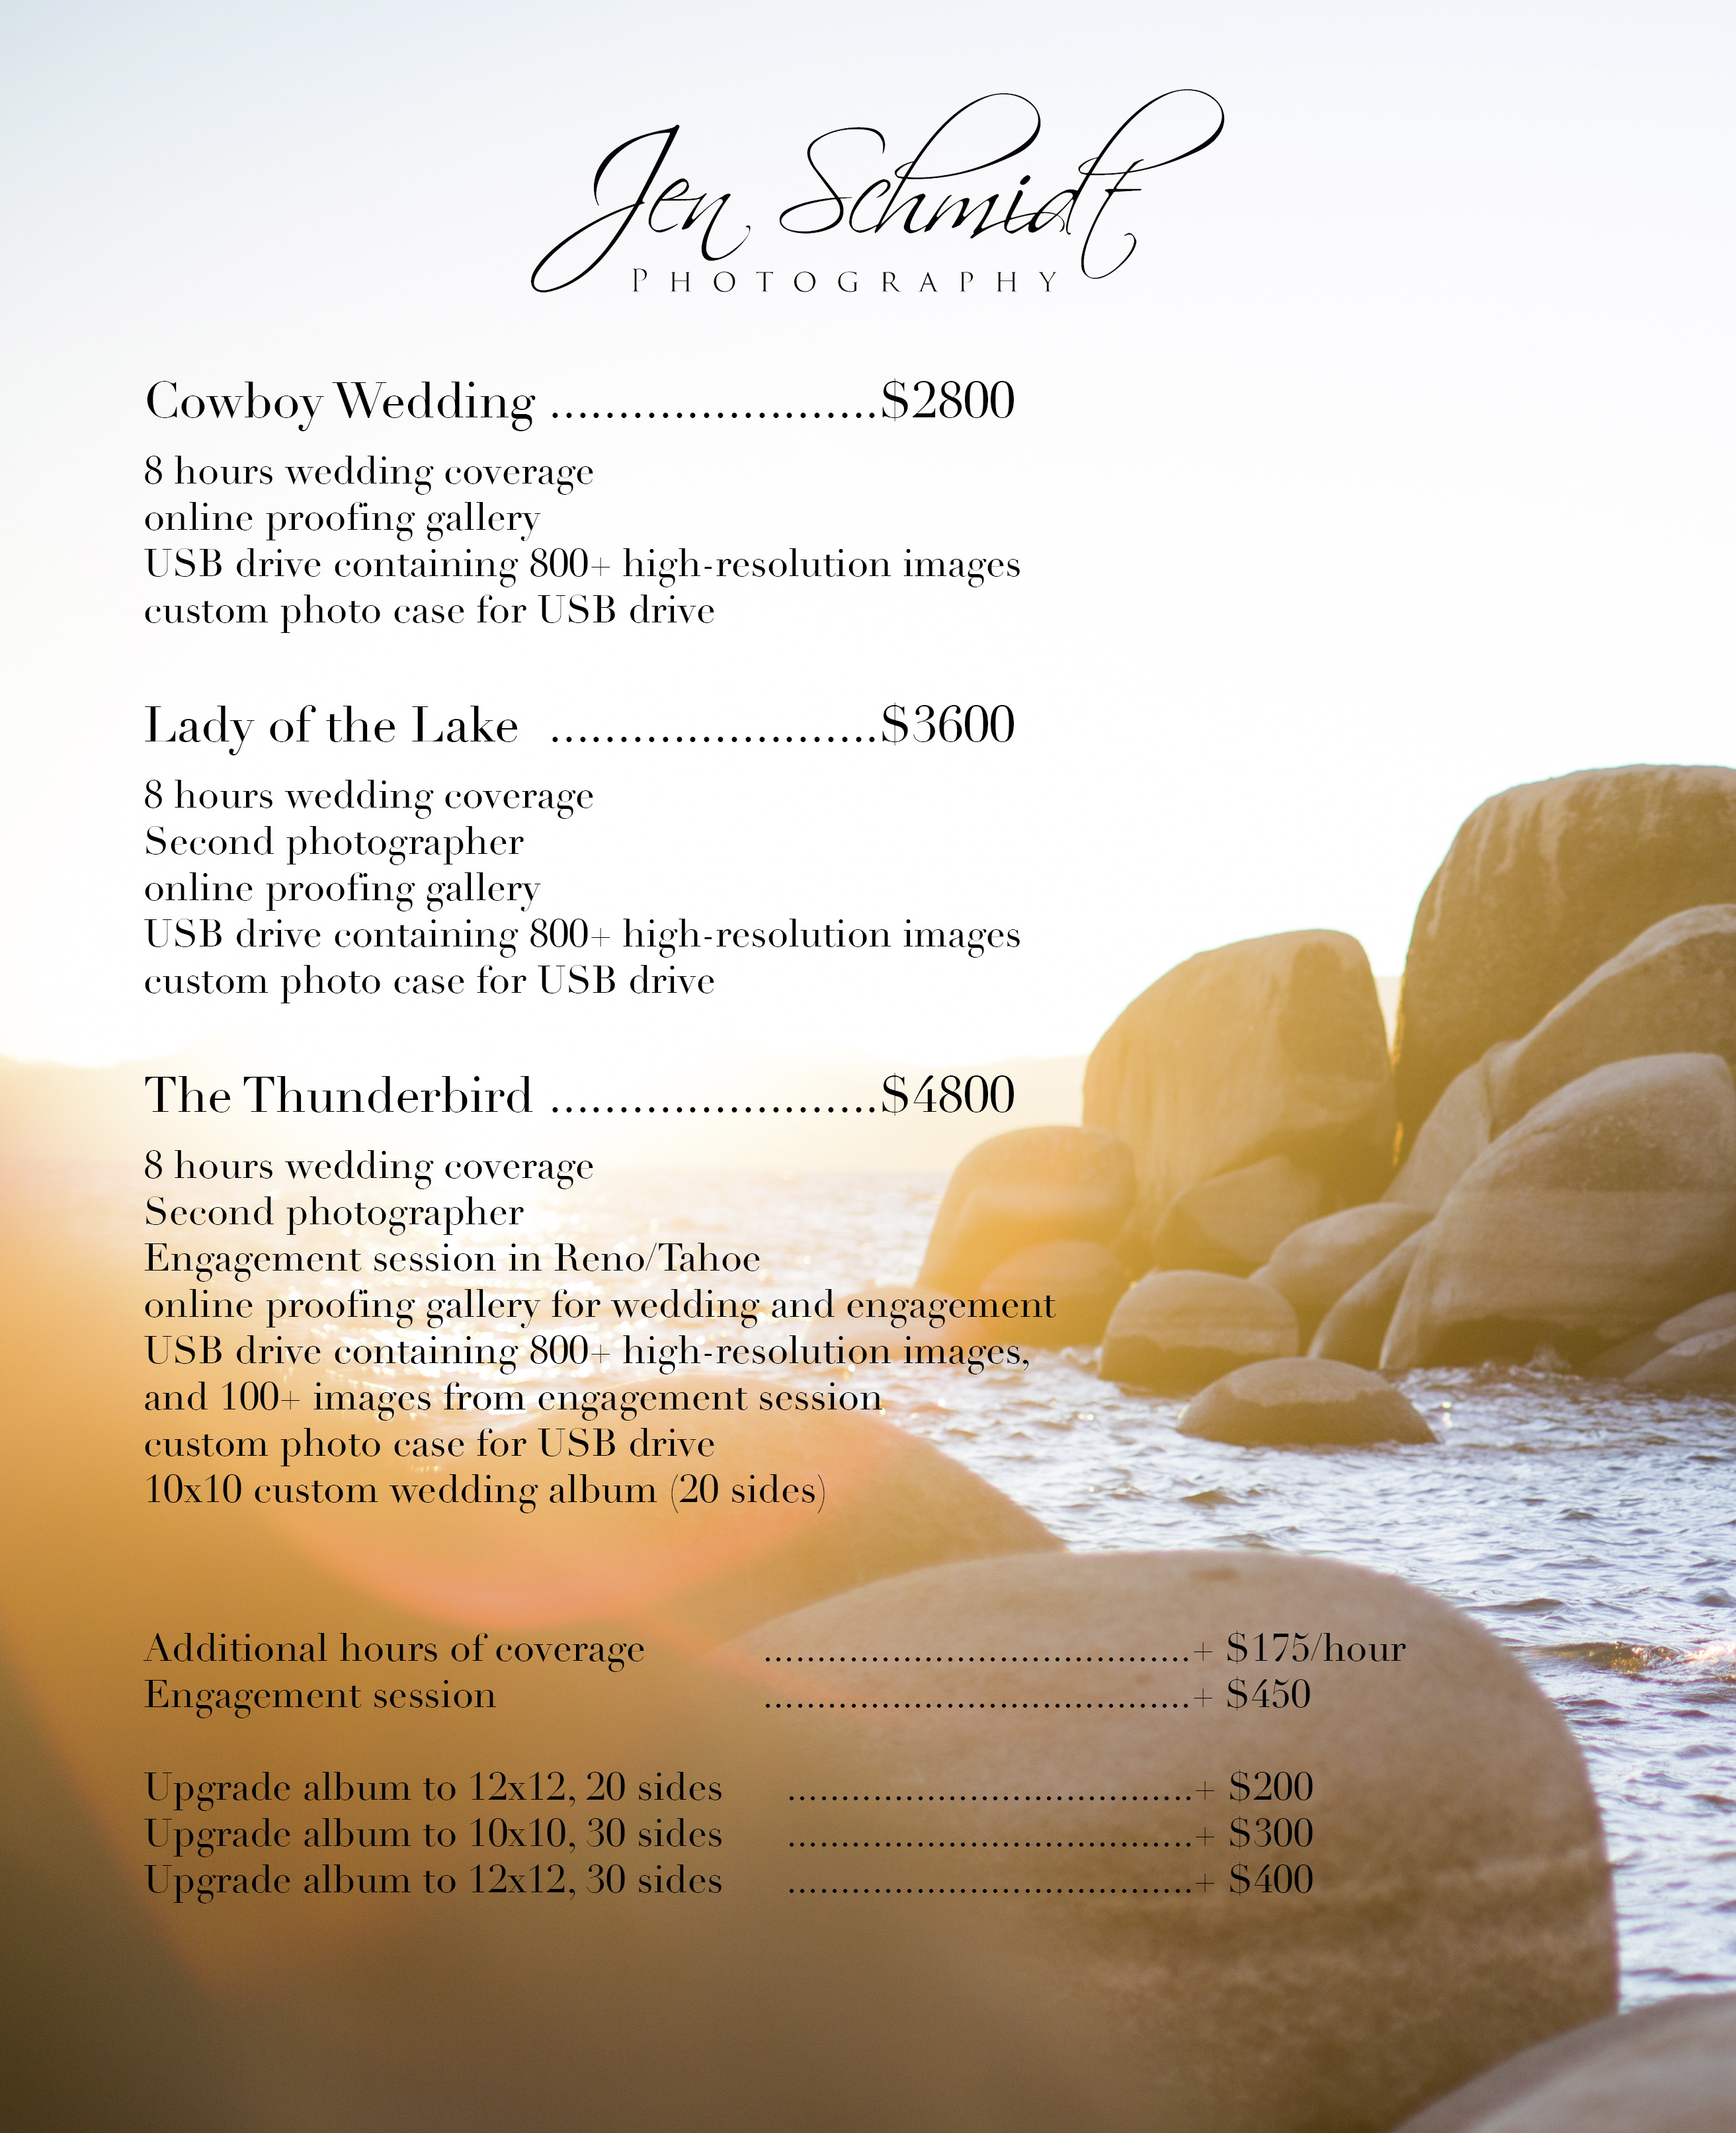 Jen Schmidt Tahoe Wedding Packages 2014 A